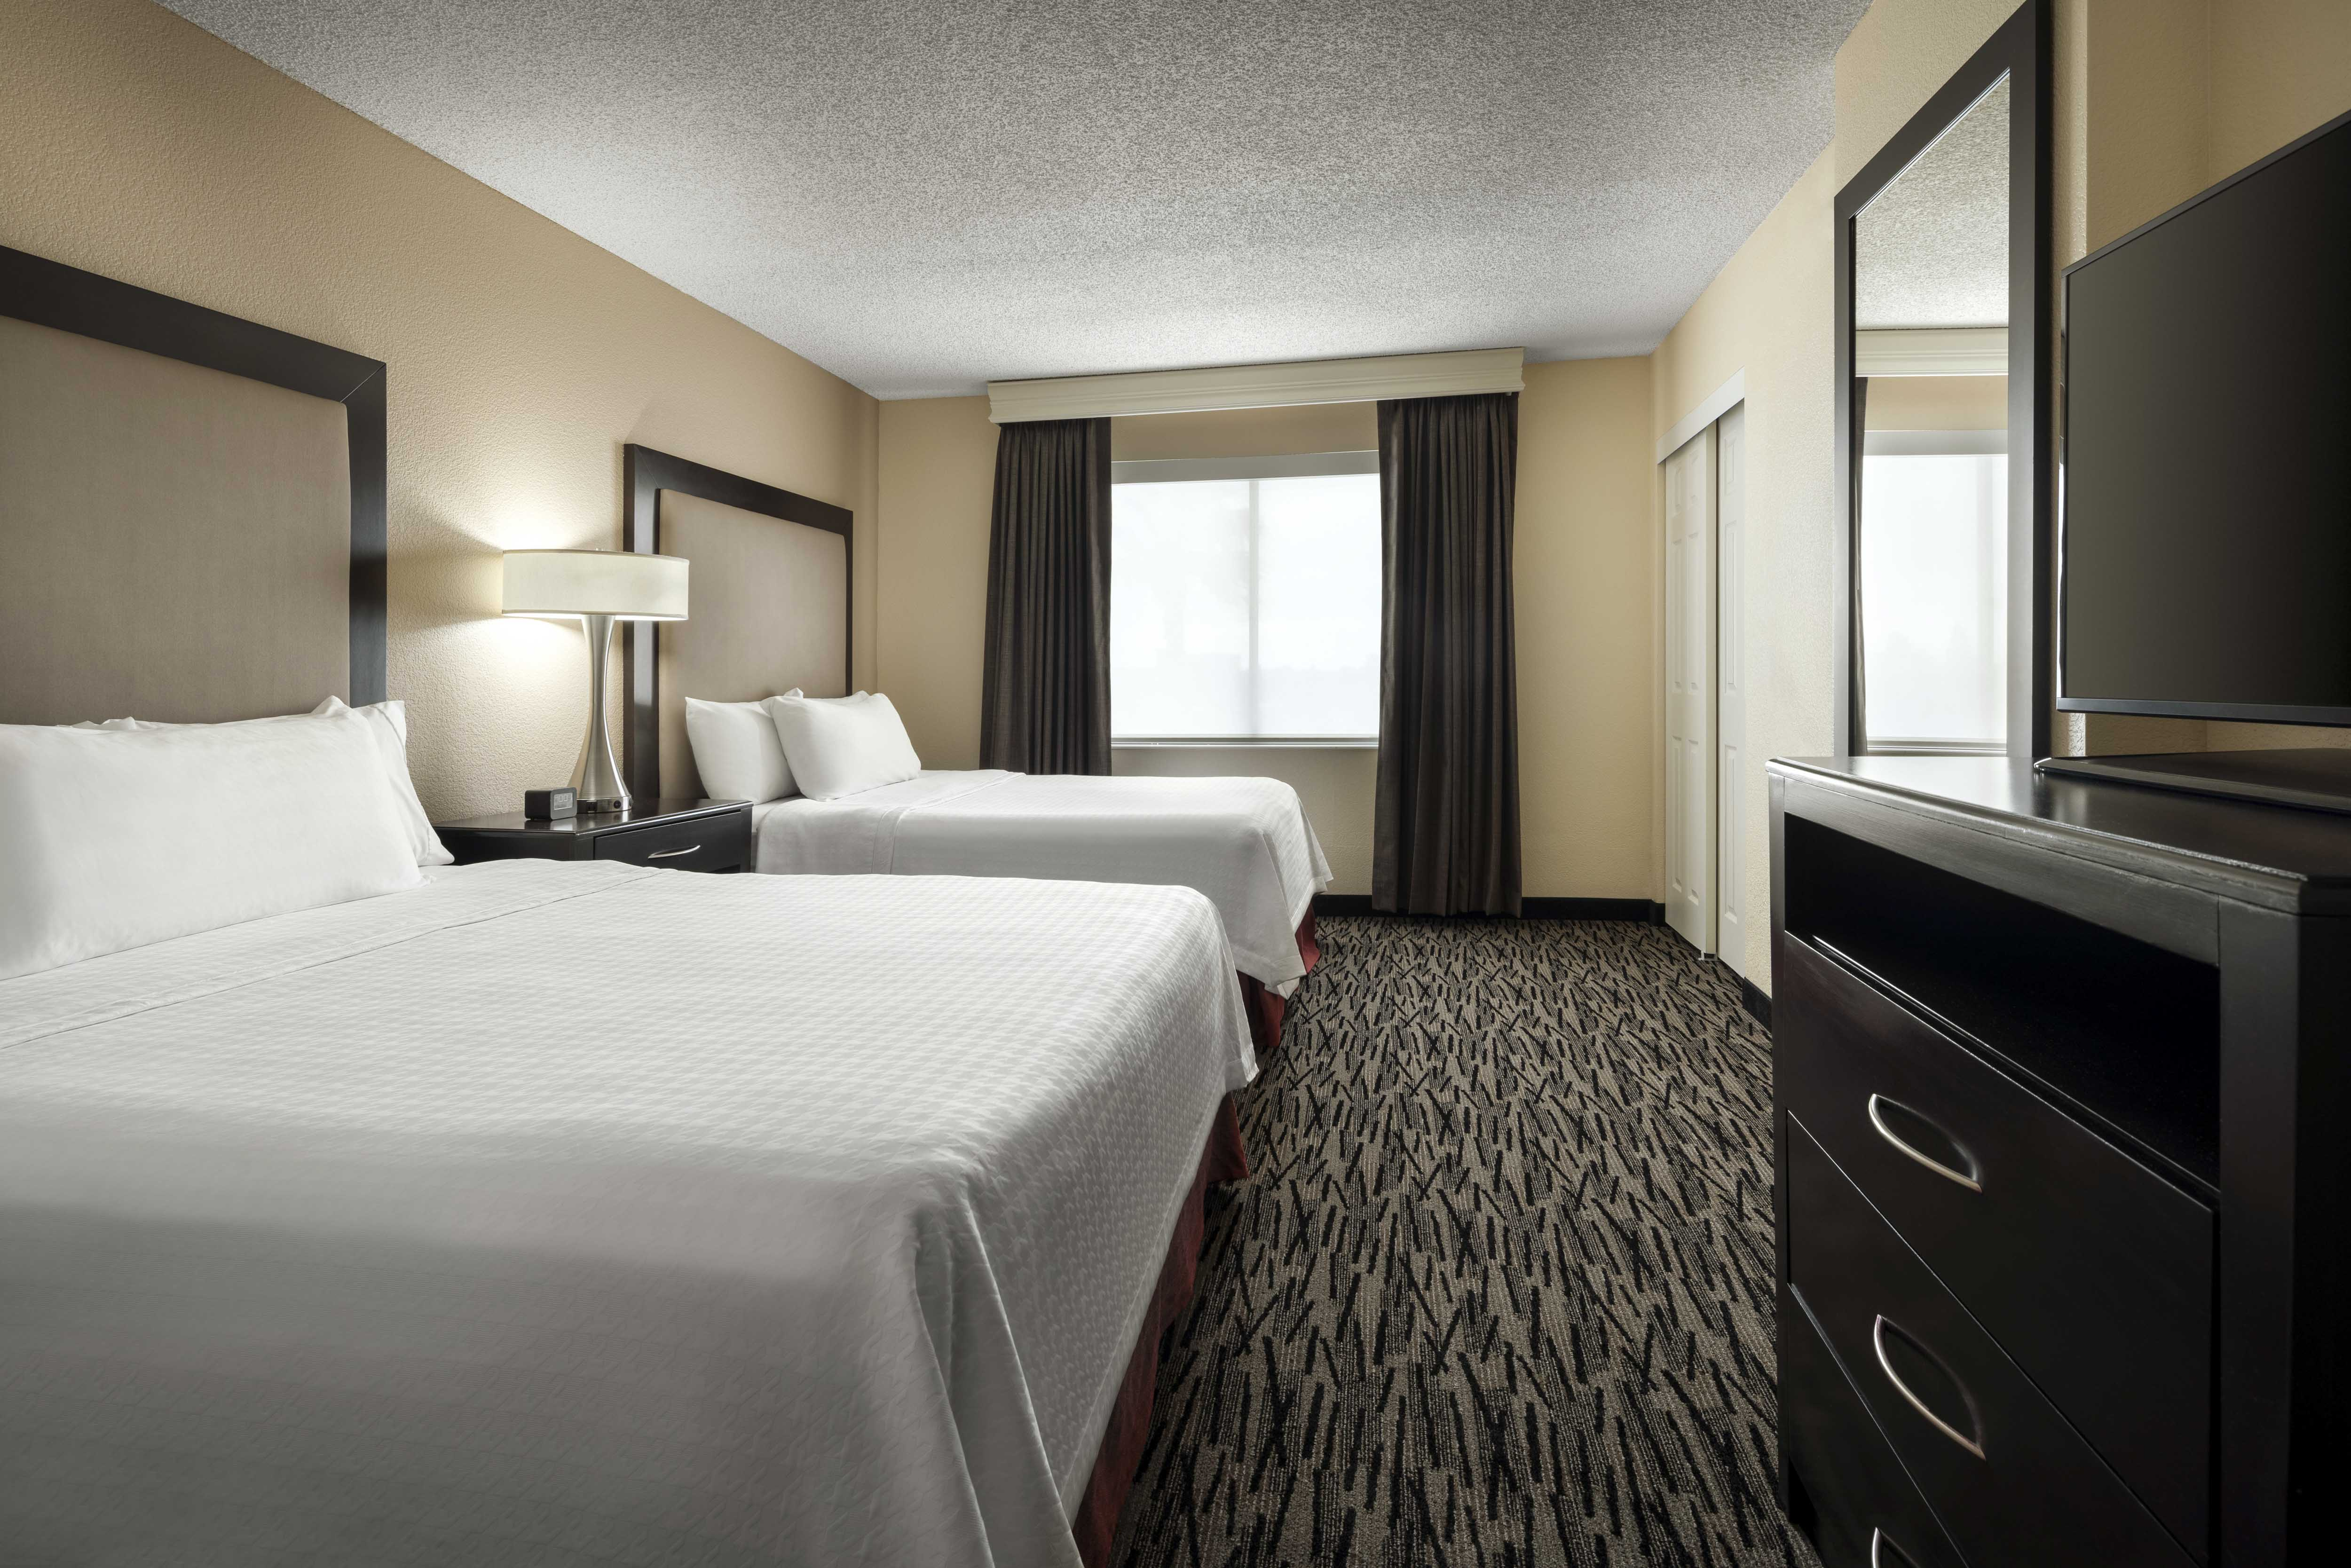 Homewood Suites By Hilton Anaheim Main Gate Area Disneyland Hotels Anaheim Hotels 2 Queen Beds 1 Bedroom Suite